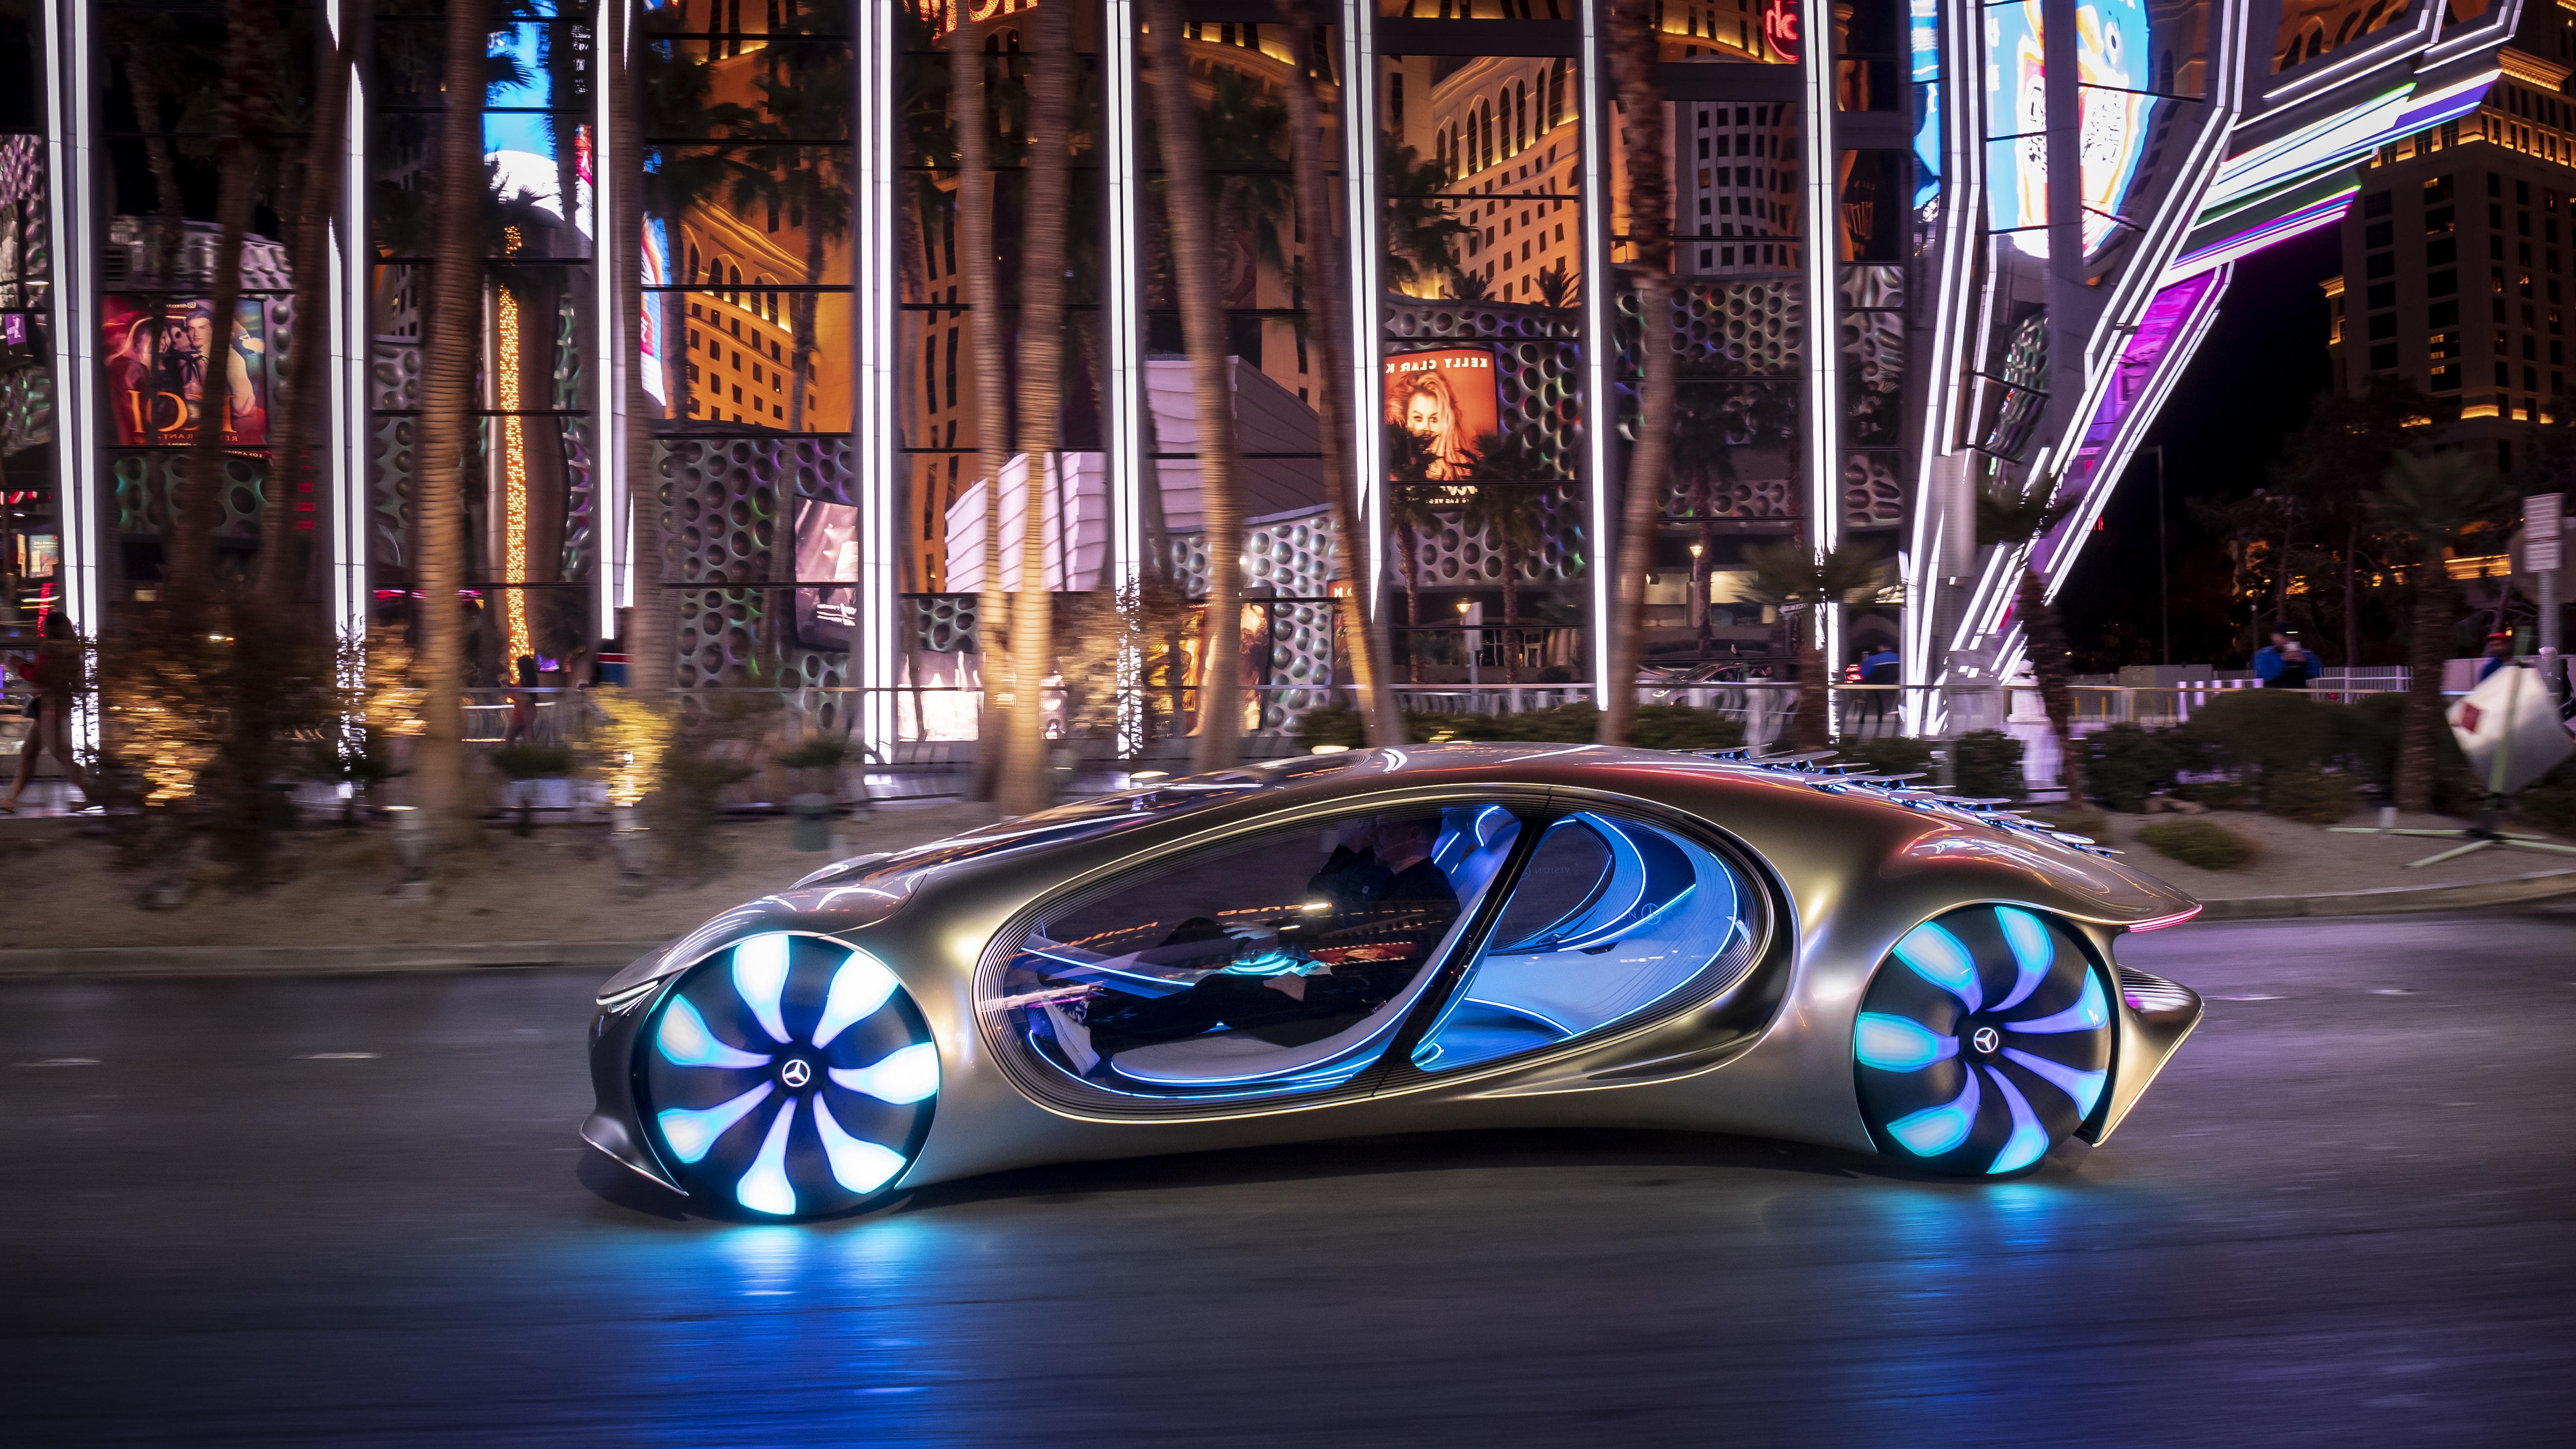 2020 Mercedes Benz VISION AVTR 5K Wallpaper HD Car Wallpapers 5120x2880